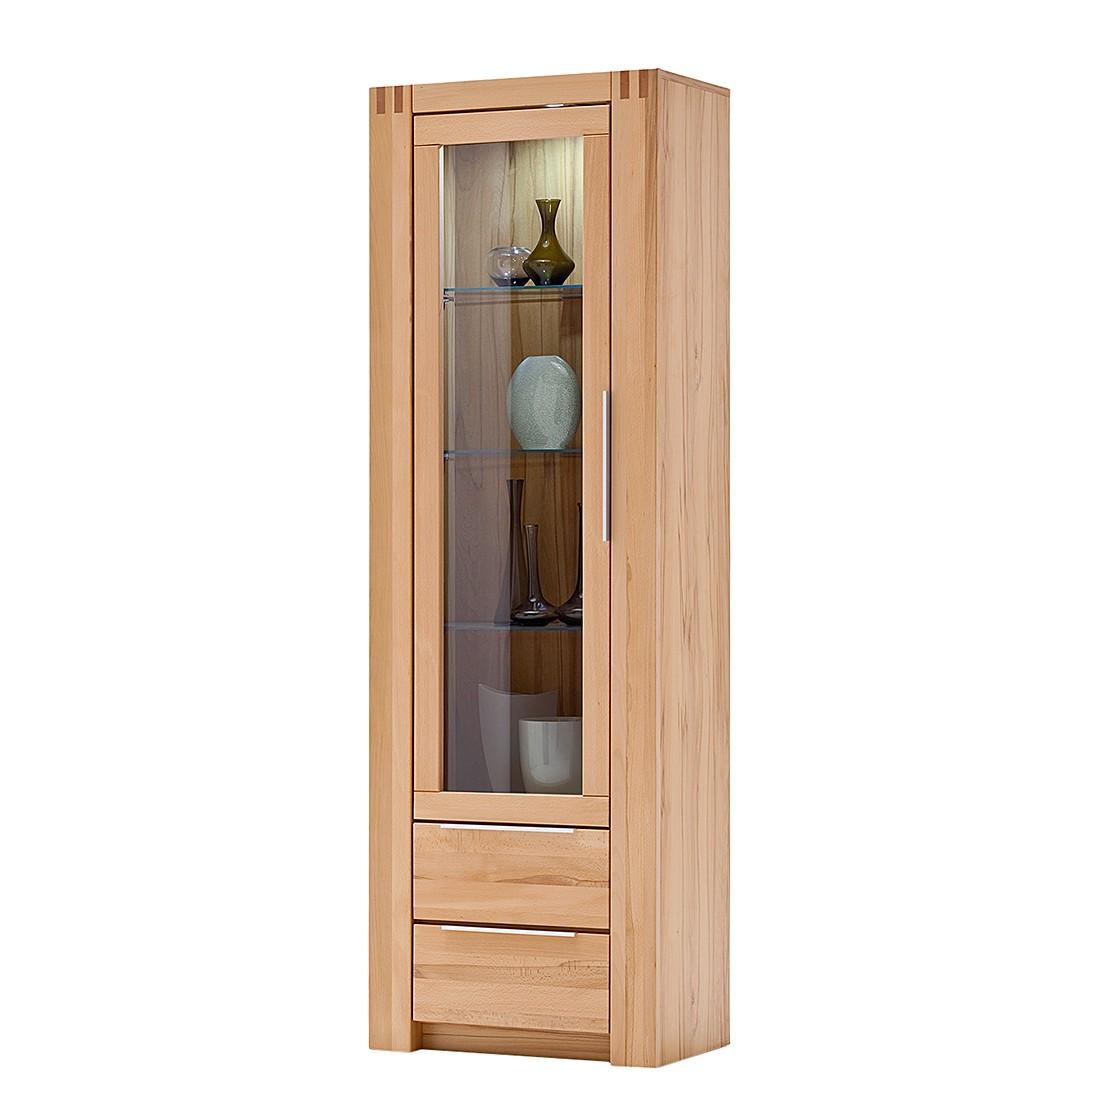 eek a vitrine vigas buche teilmassiv lackiert t ranschlag links jung s hne g nstig. Black Bedroom Furniture Sets. Home Design Ideas